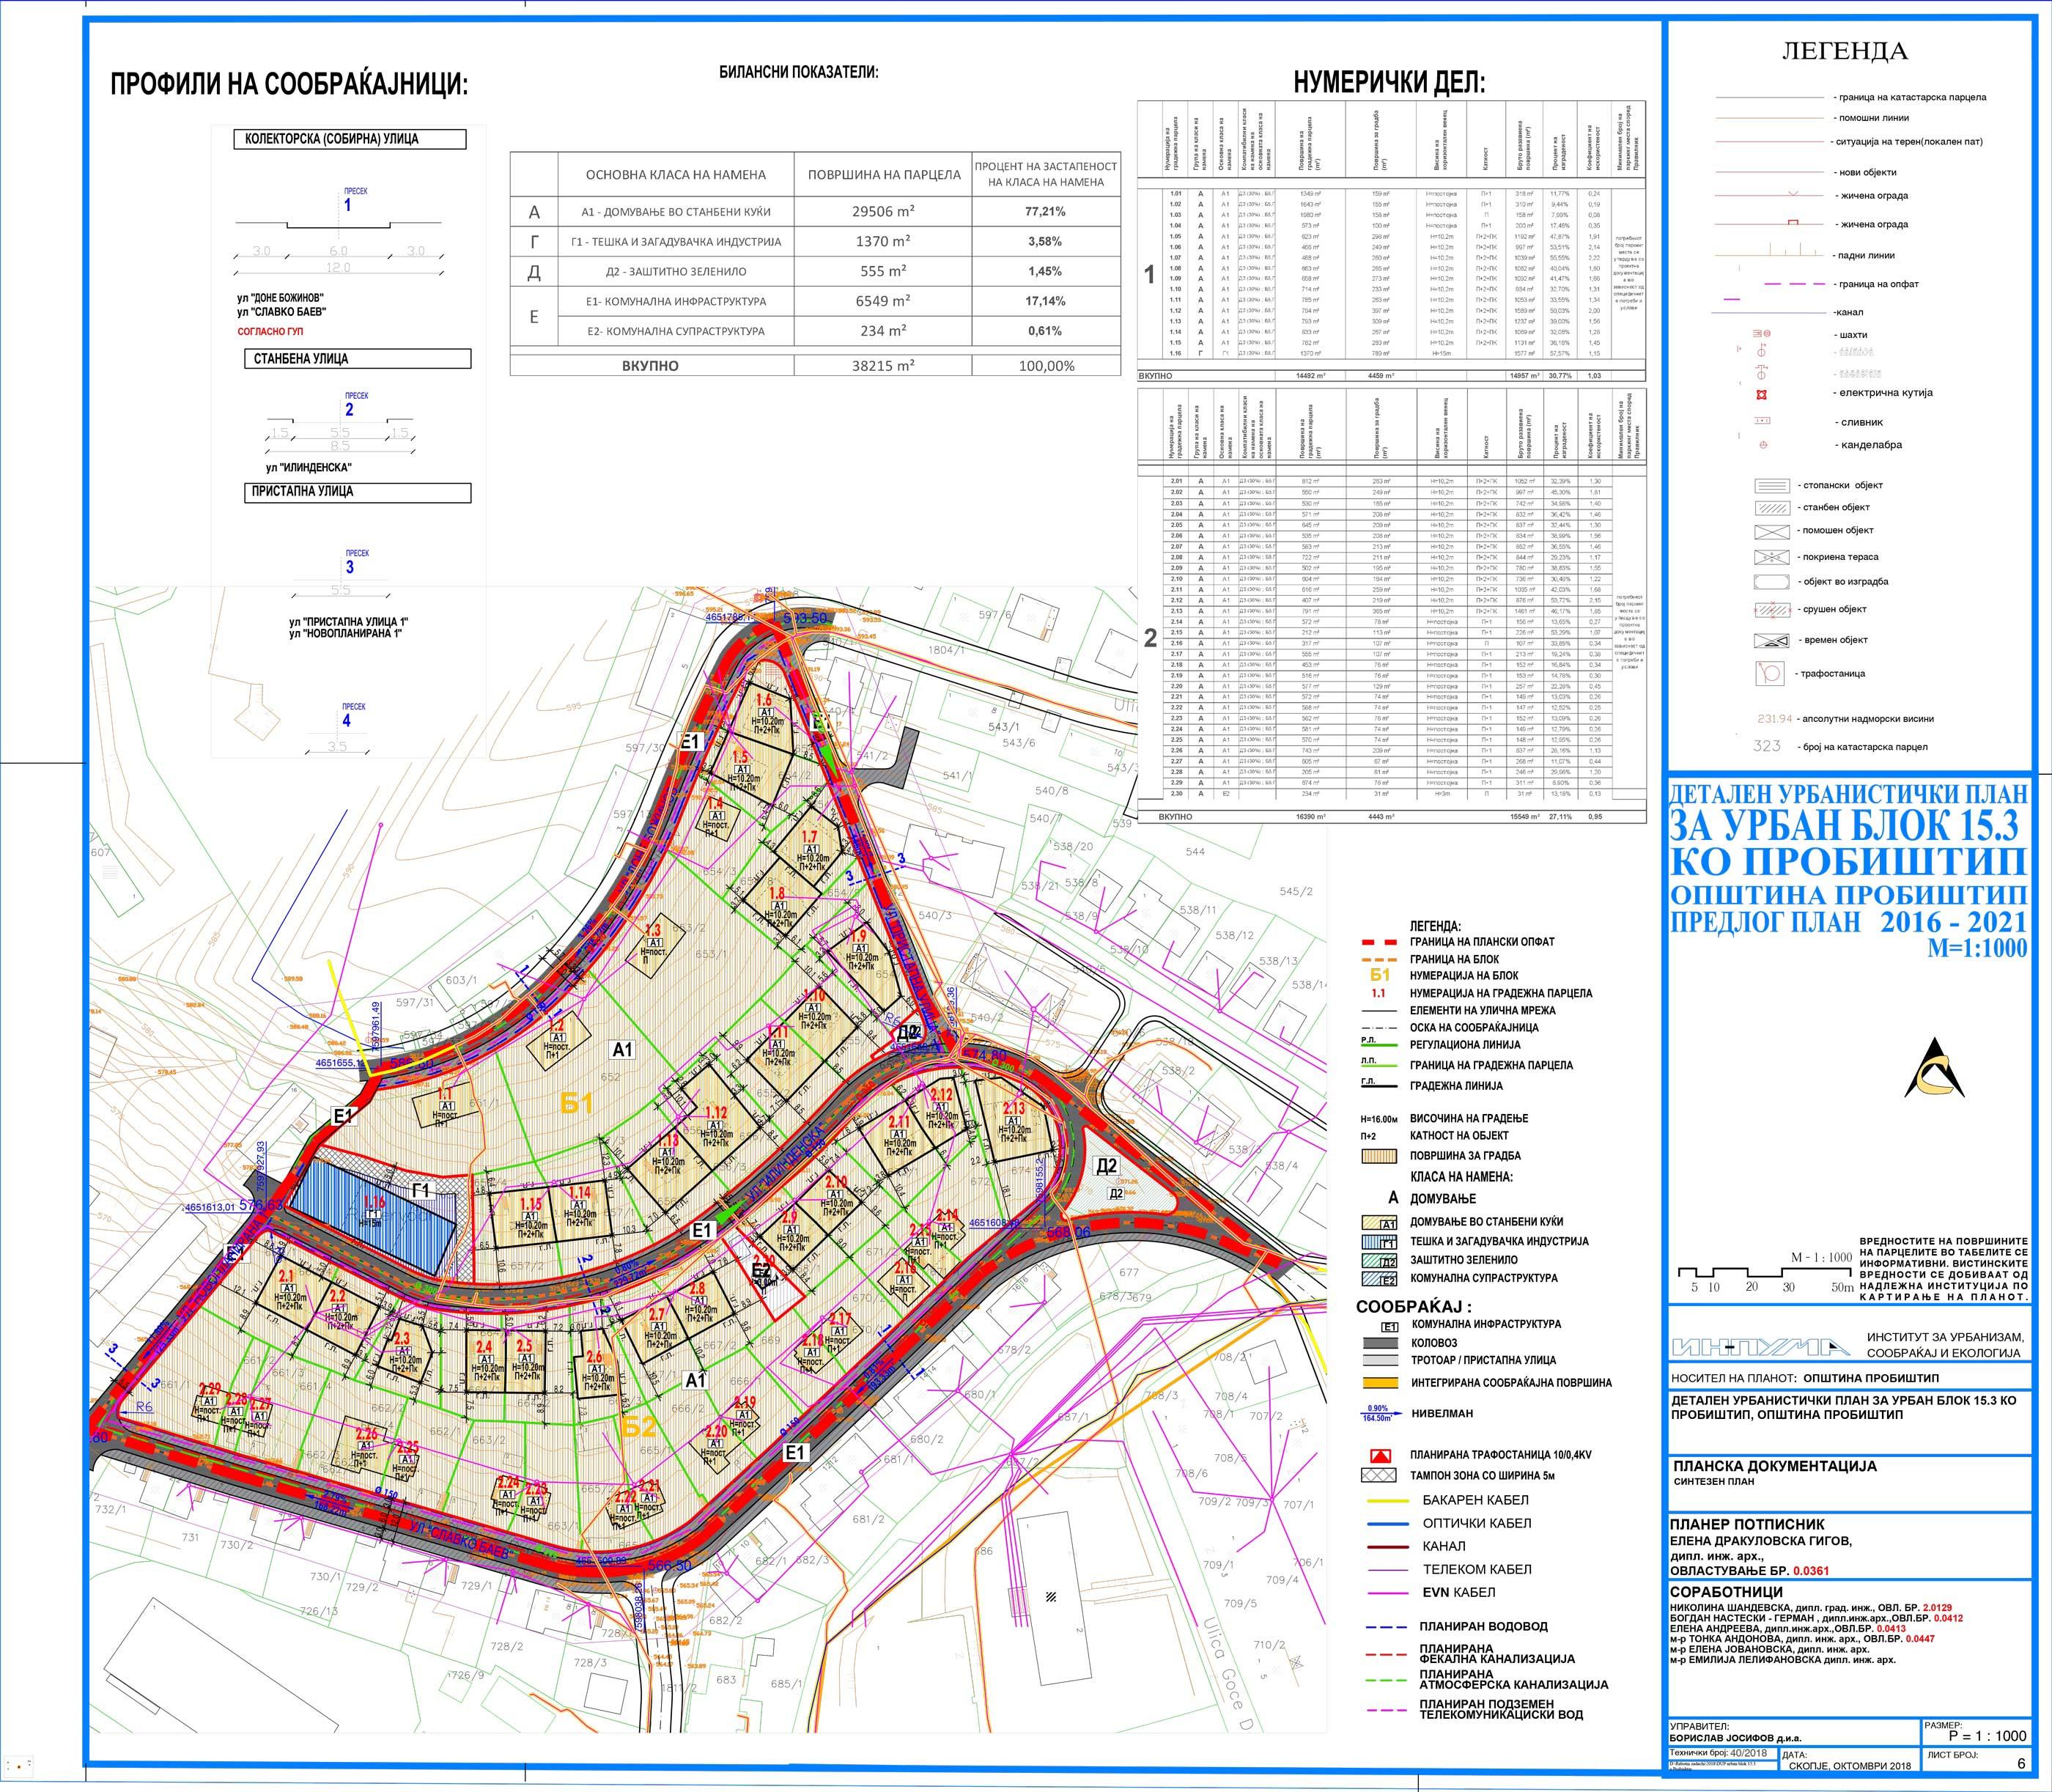 Urban-blok-15.3---Predlog-plan-167